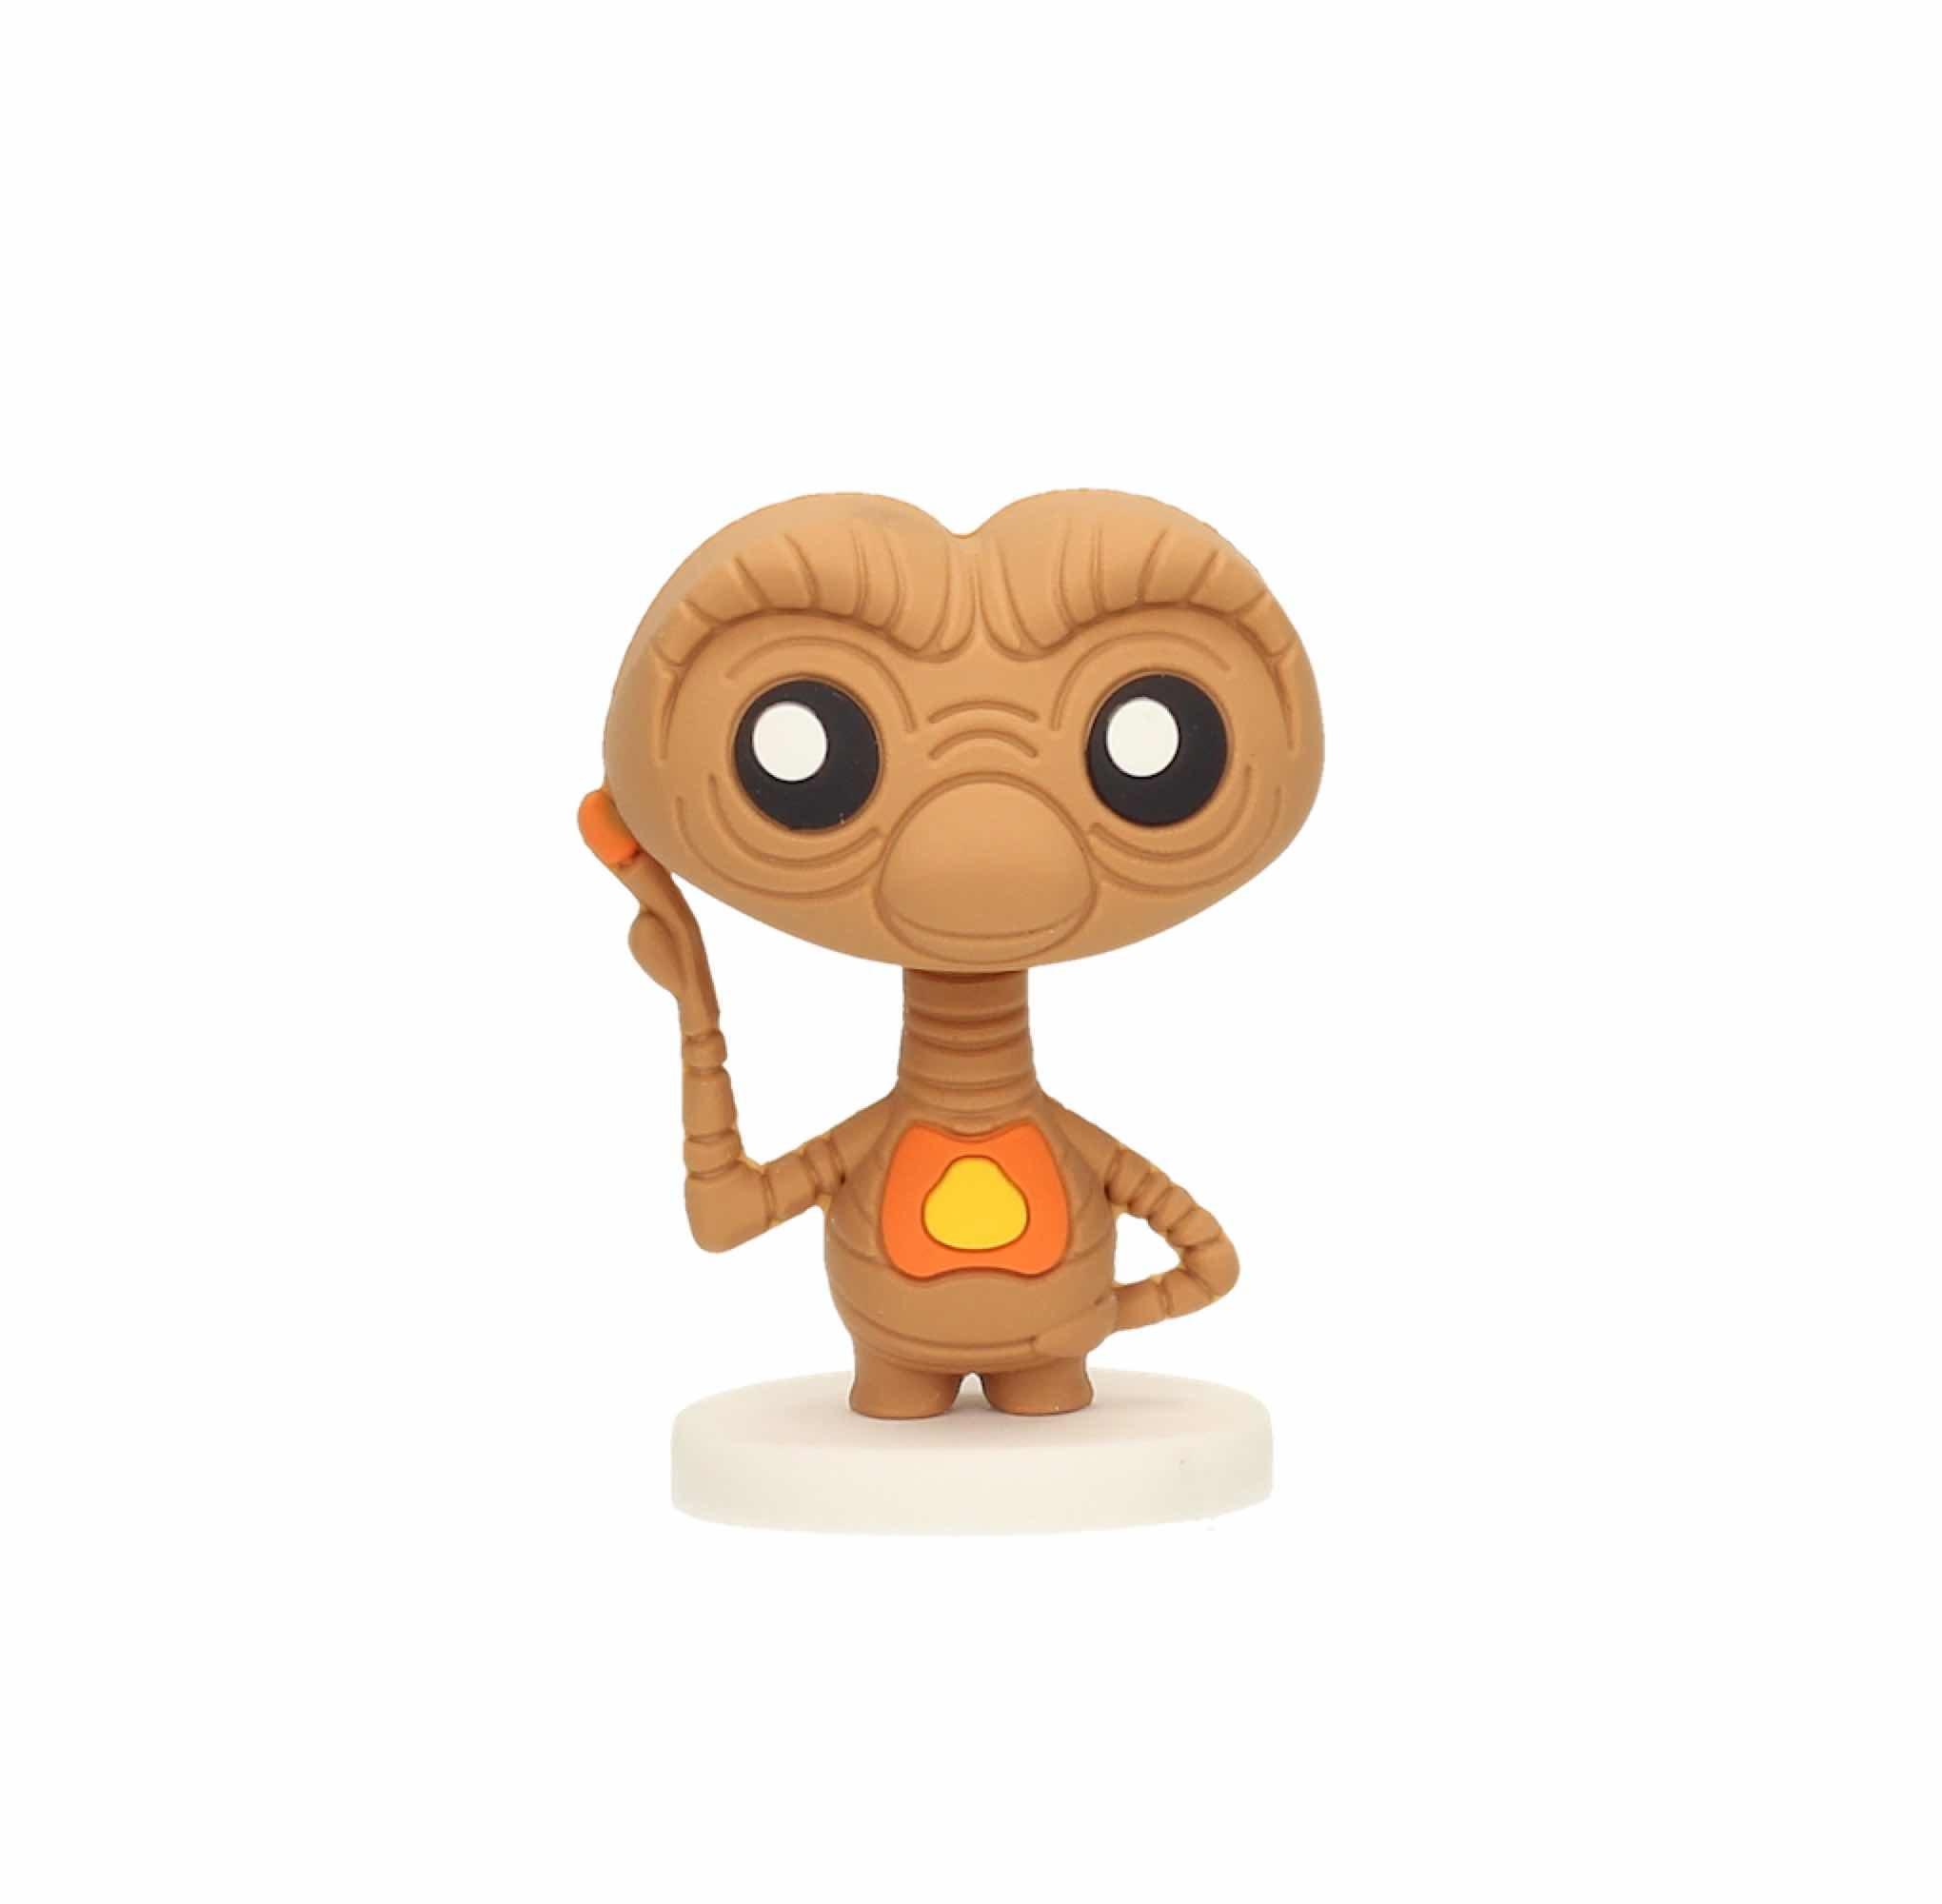 SD Toys E.T. the Extra-Terrestrial: E.T. Pokis Figure